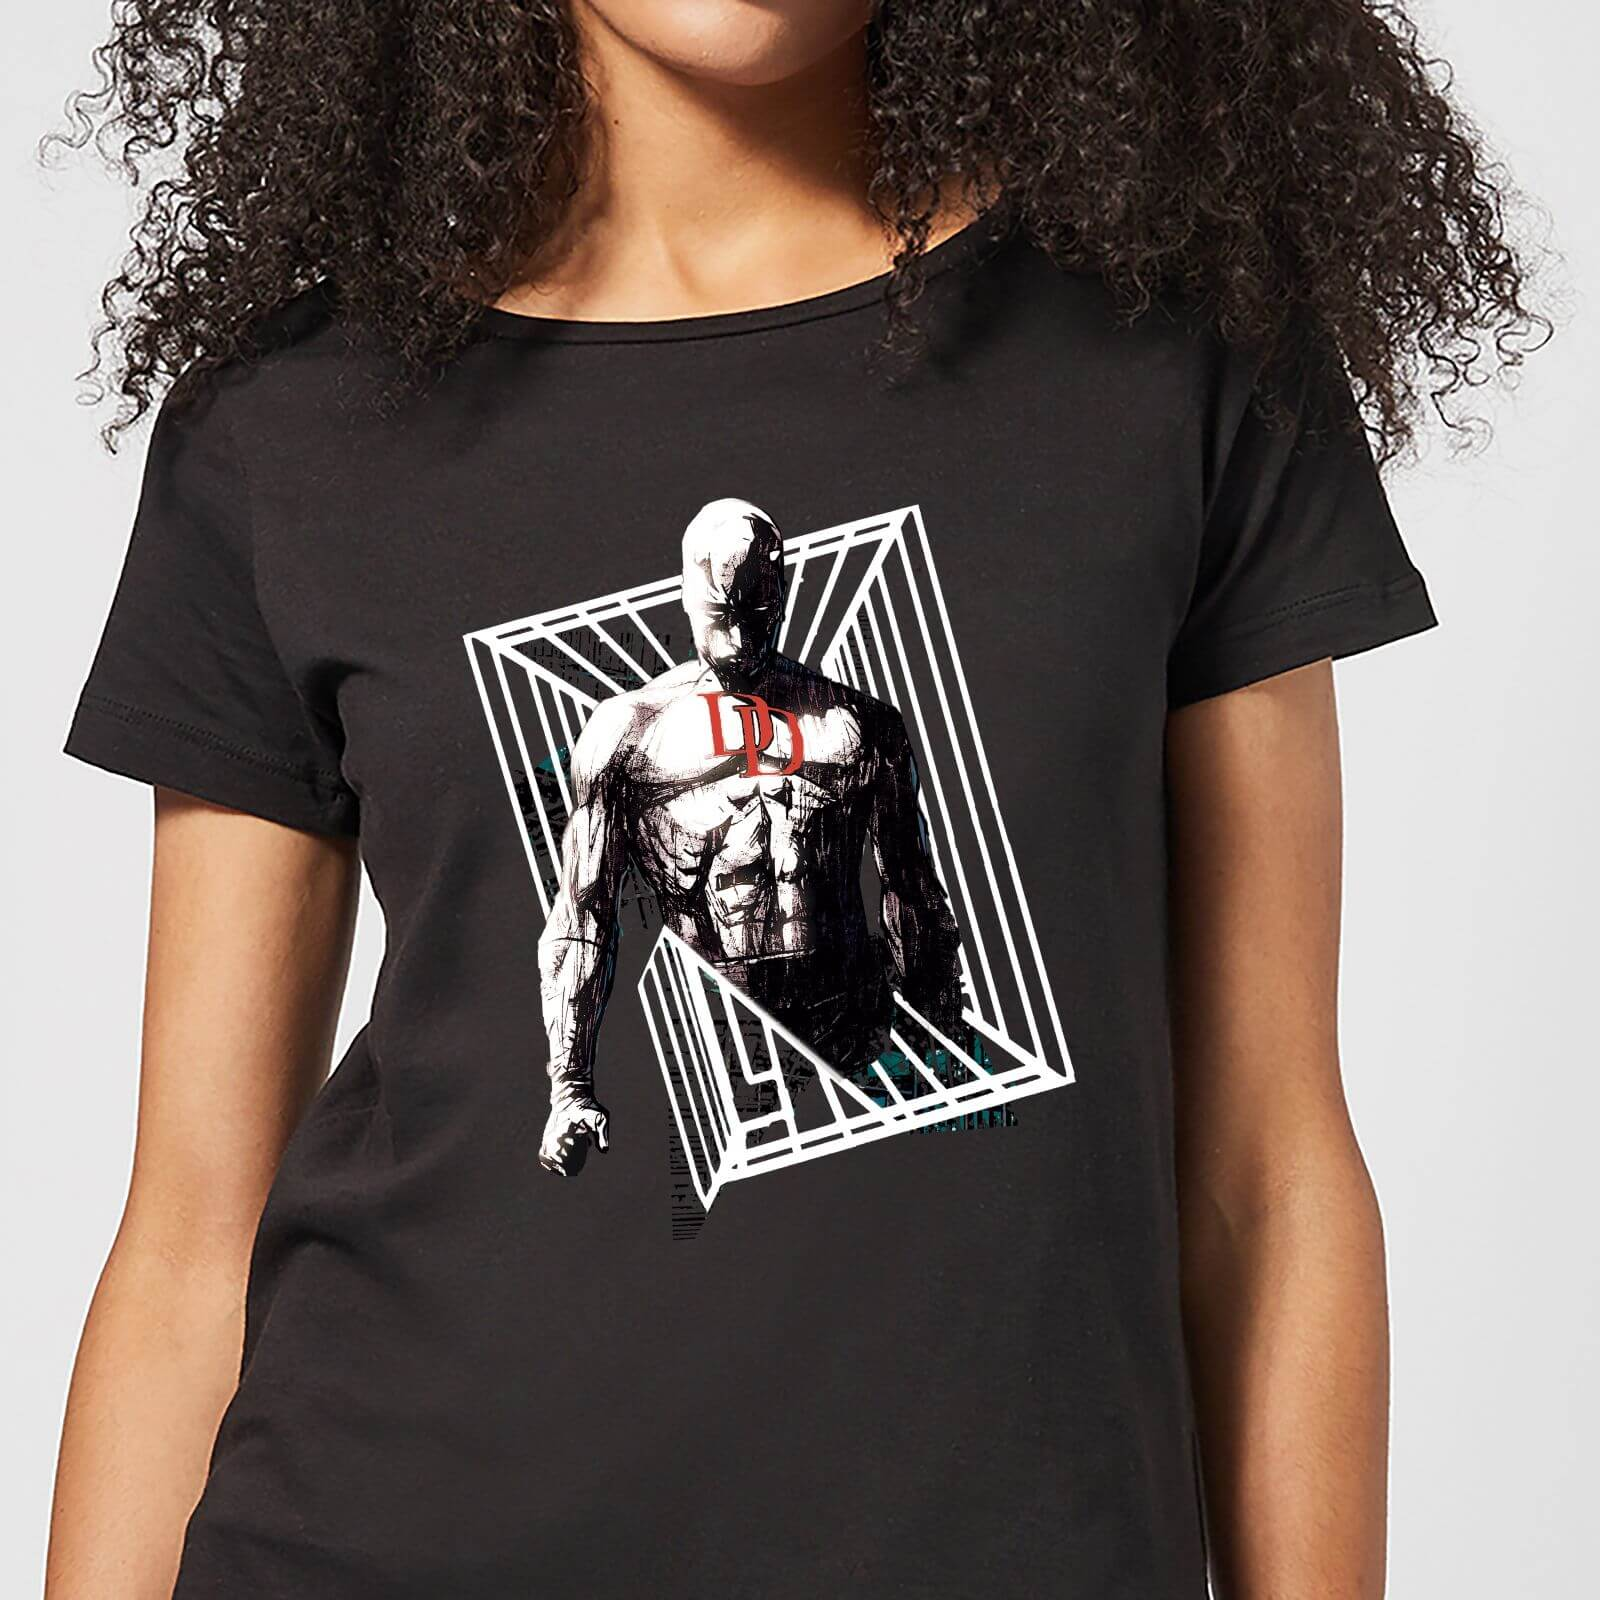 OfferteWeb.click 36-t-shirt-marvel-knights-daredevil-cage-nero-donna-m